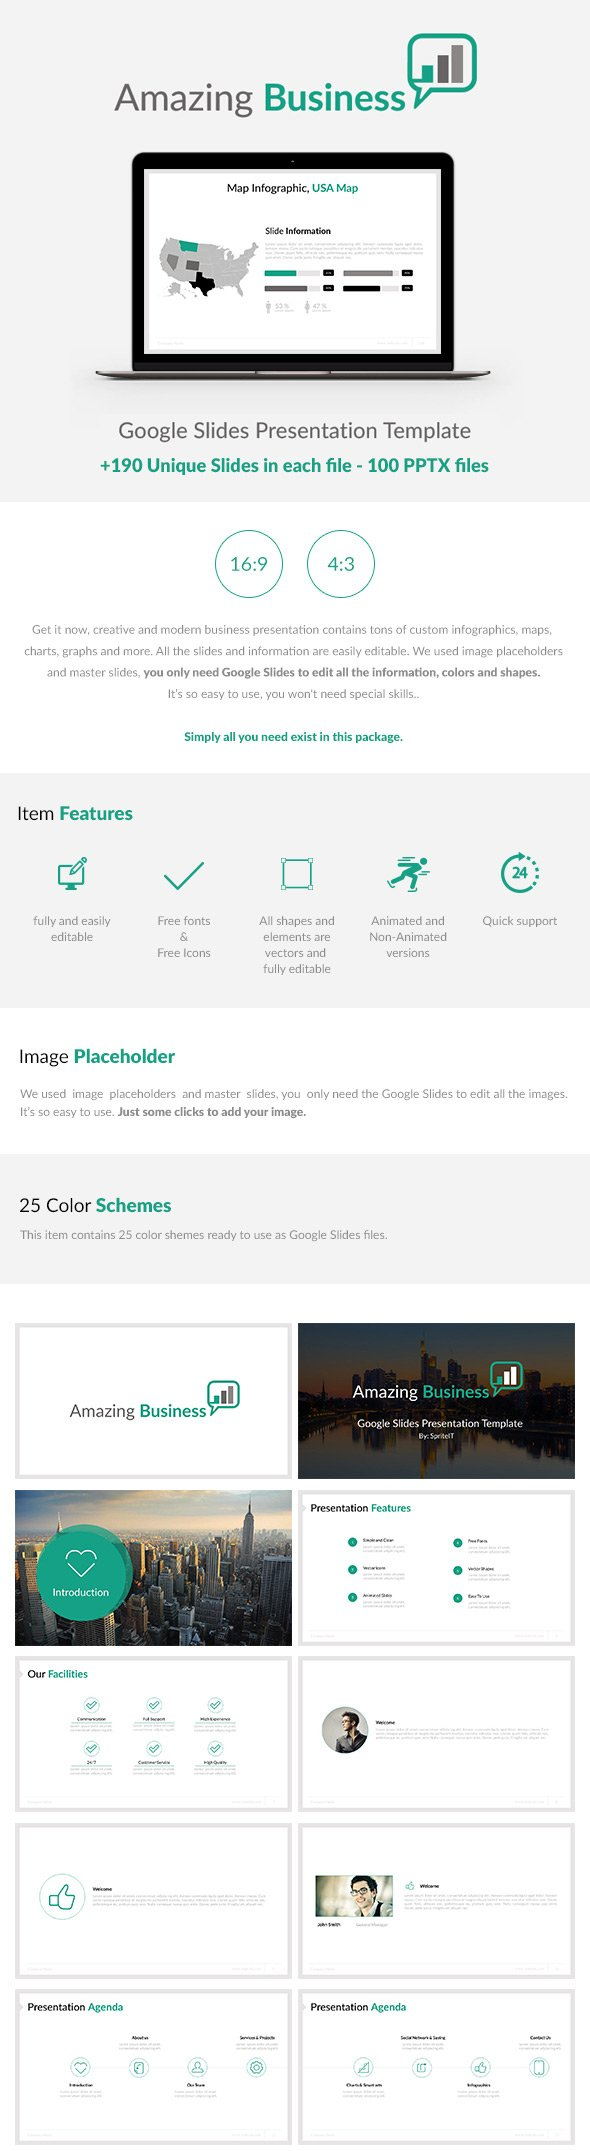 Amazing Business Google Slides Presentation